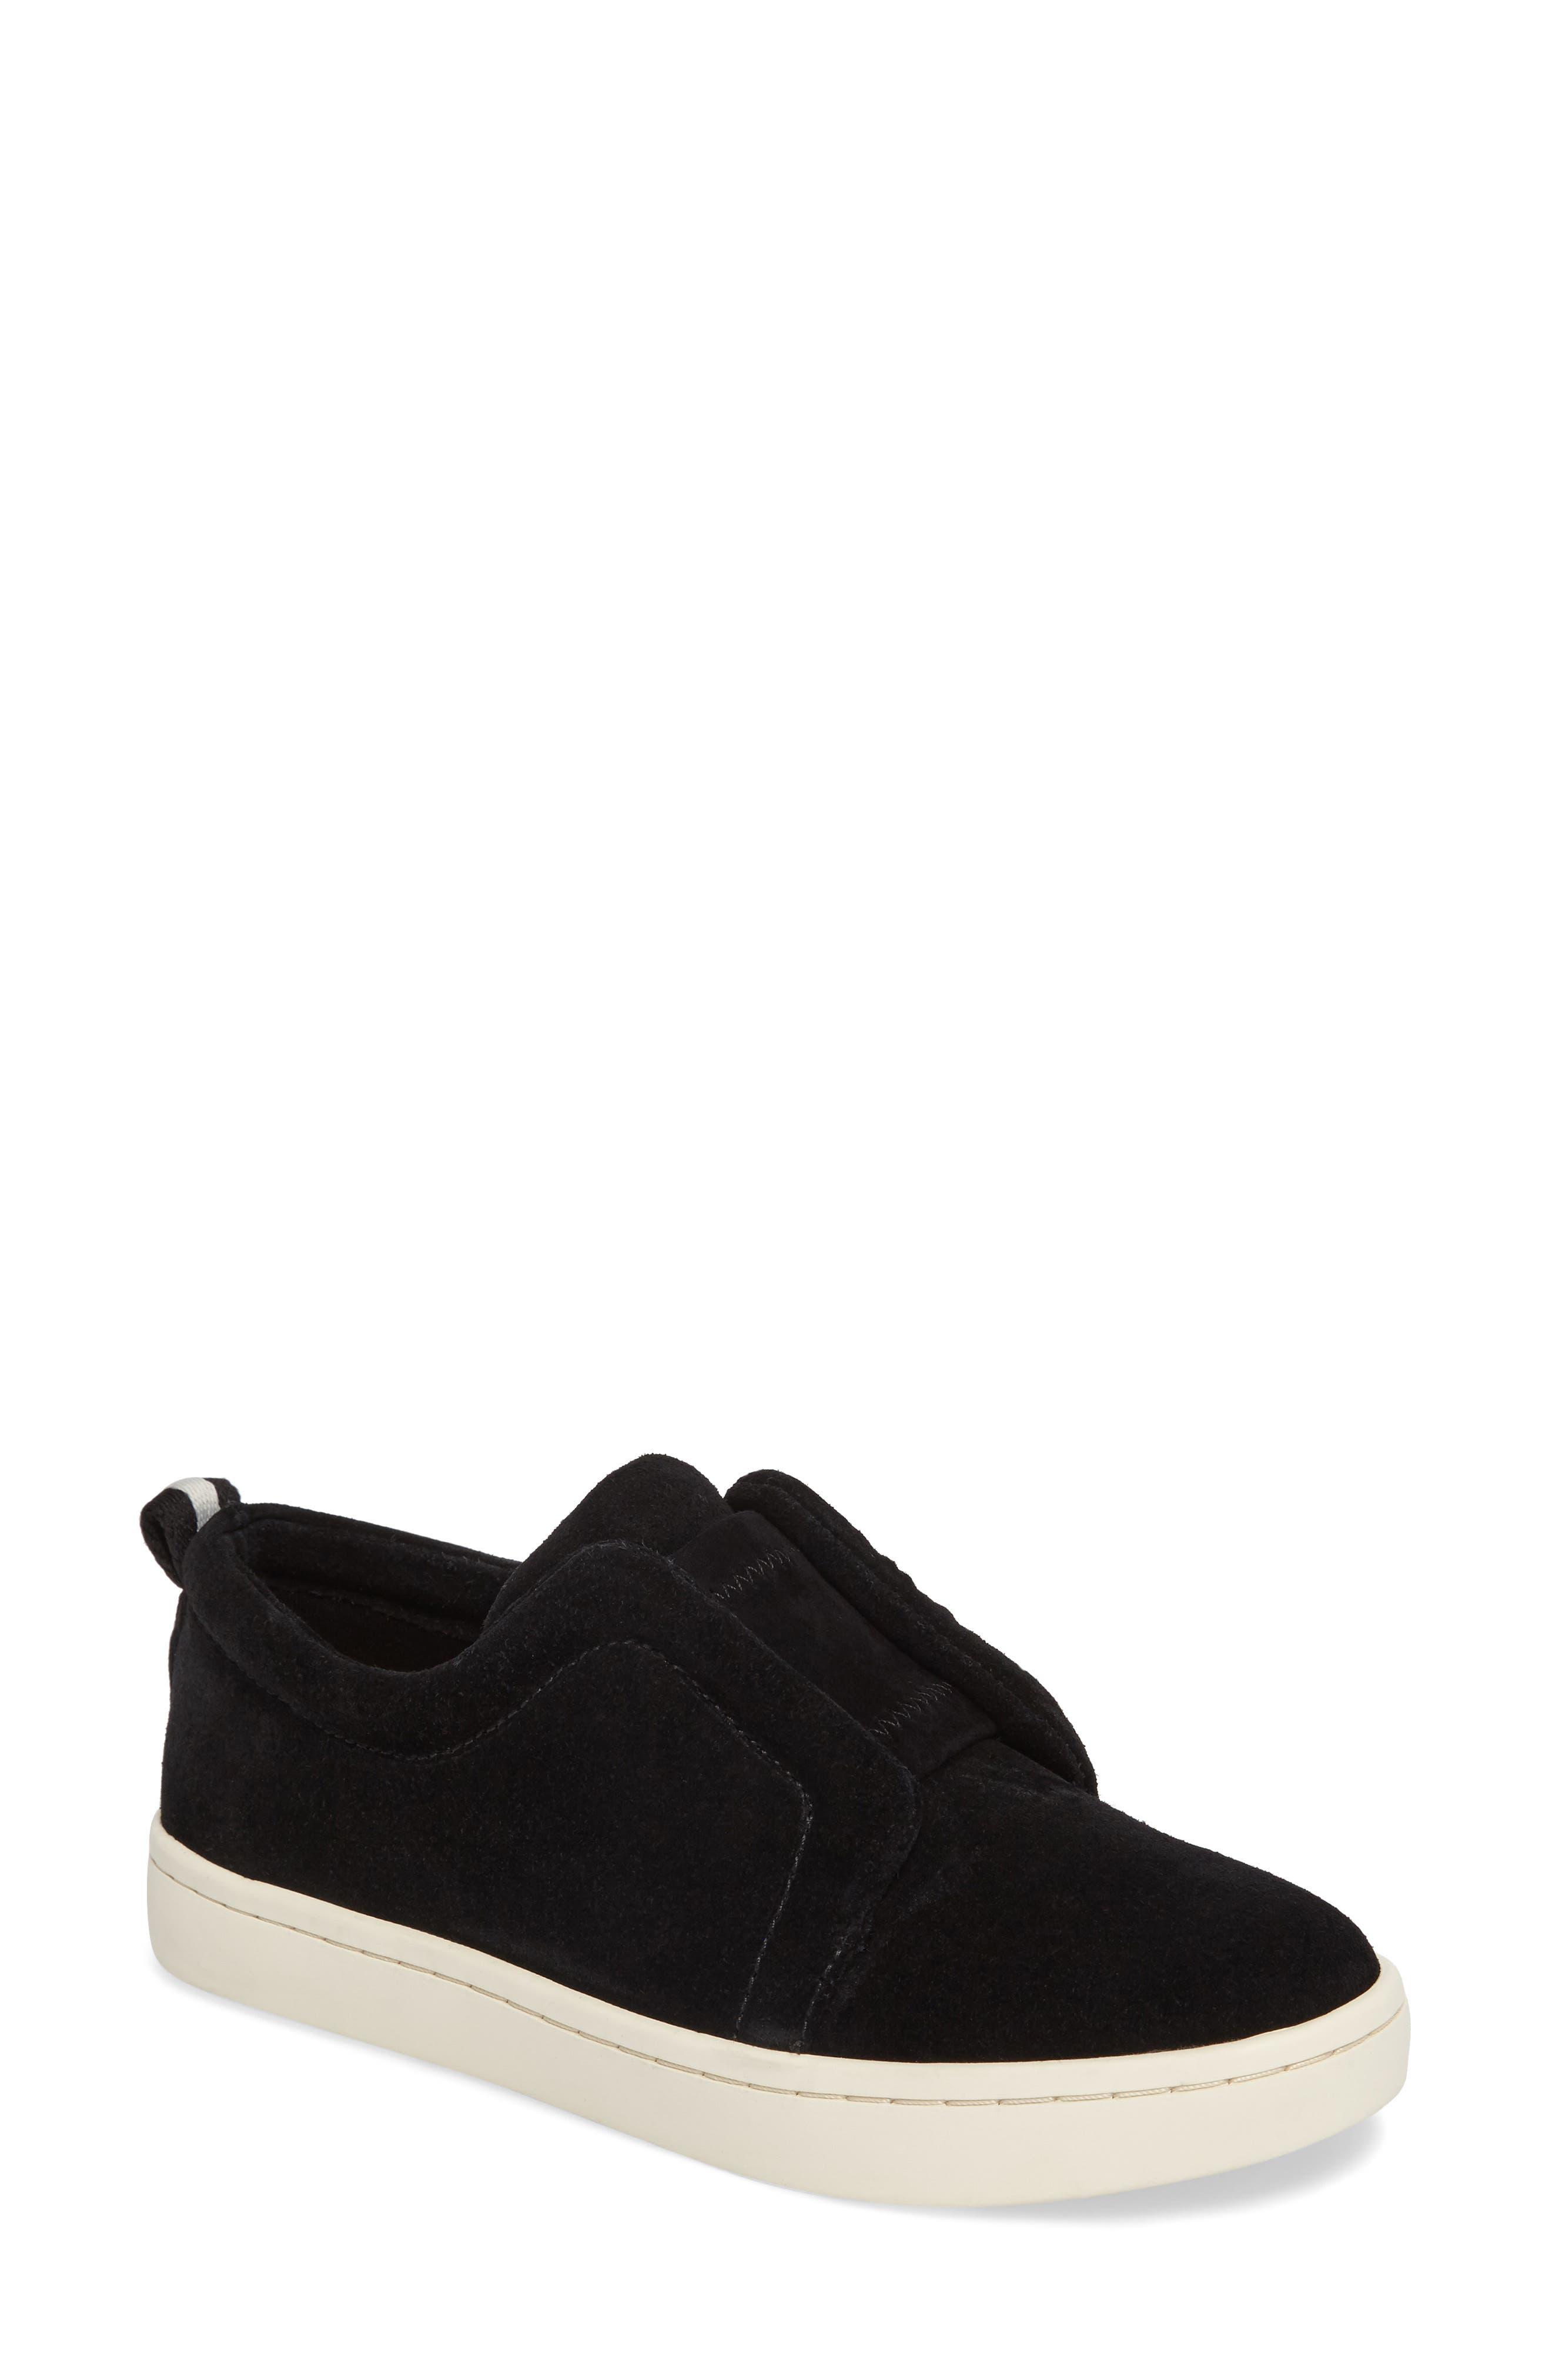 Dagny Slip-On Sneaker,                         Main,                         color, 013